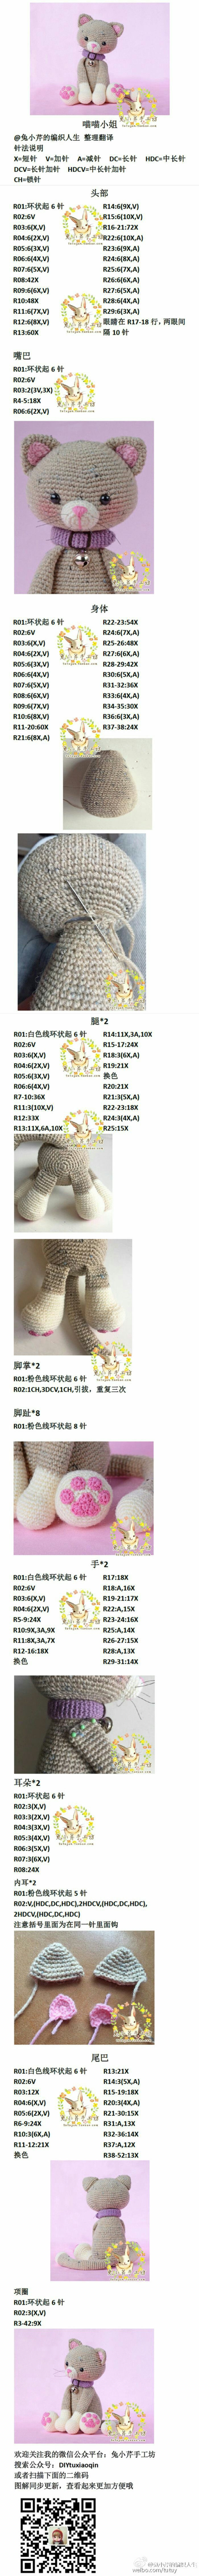 2587 best crochet images on Pinterest | Amigurumi patterns ...